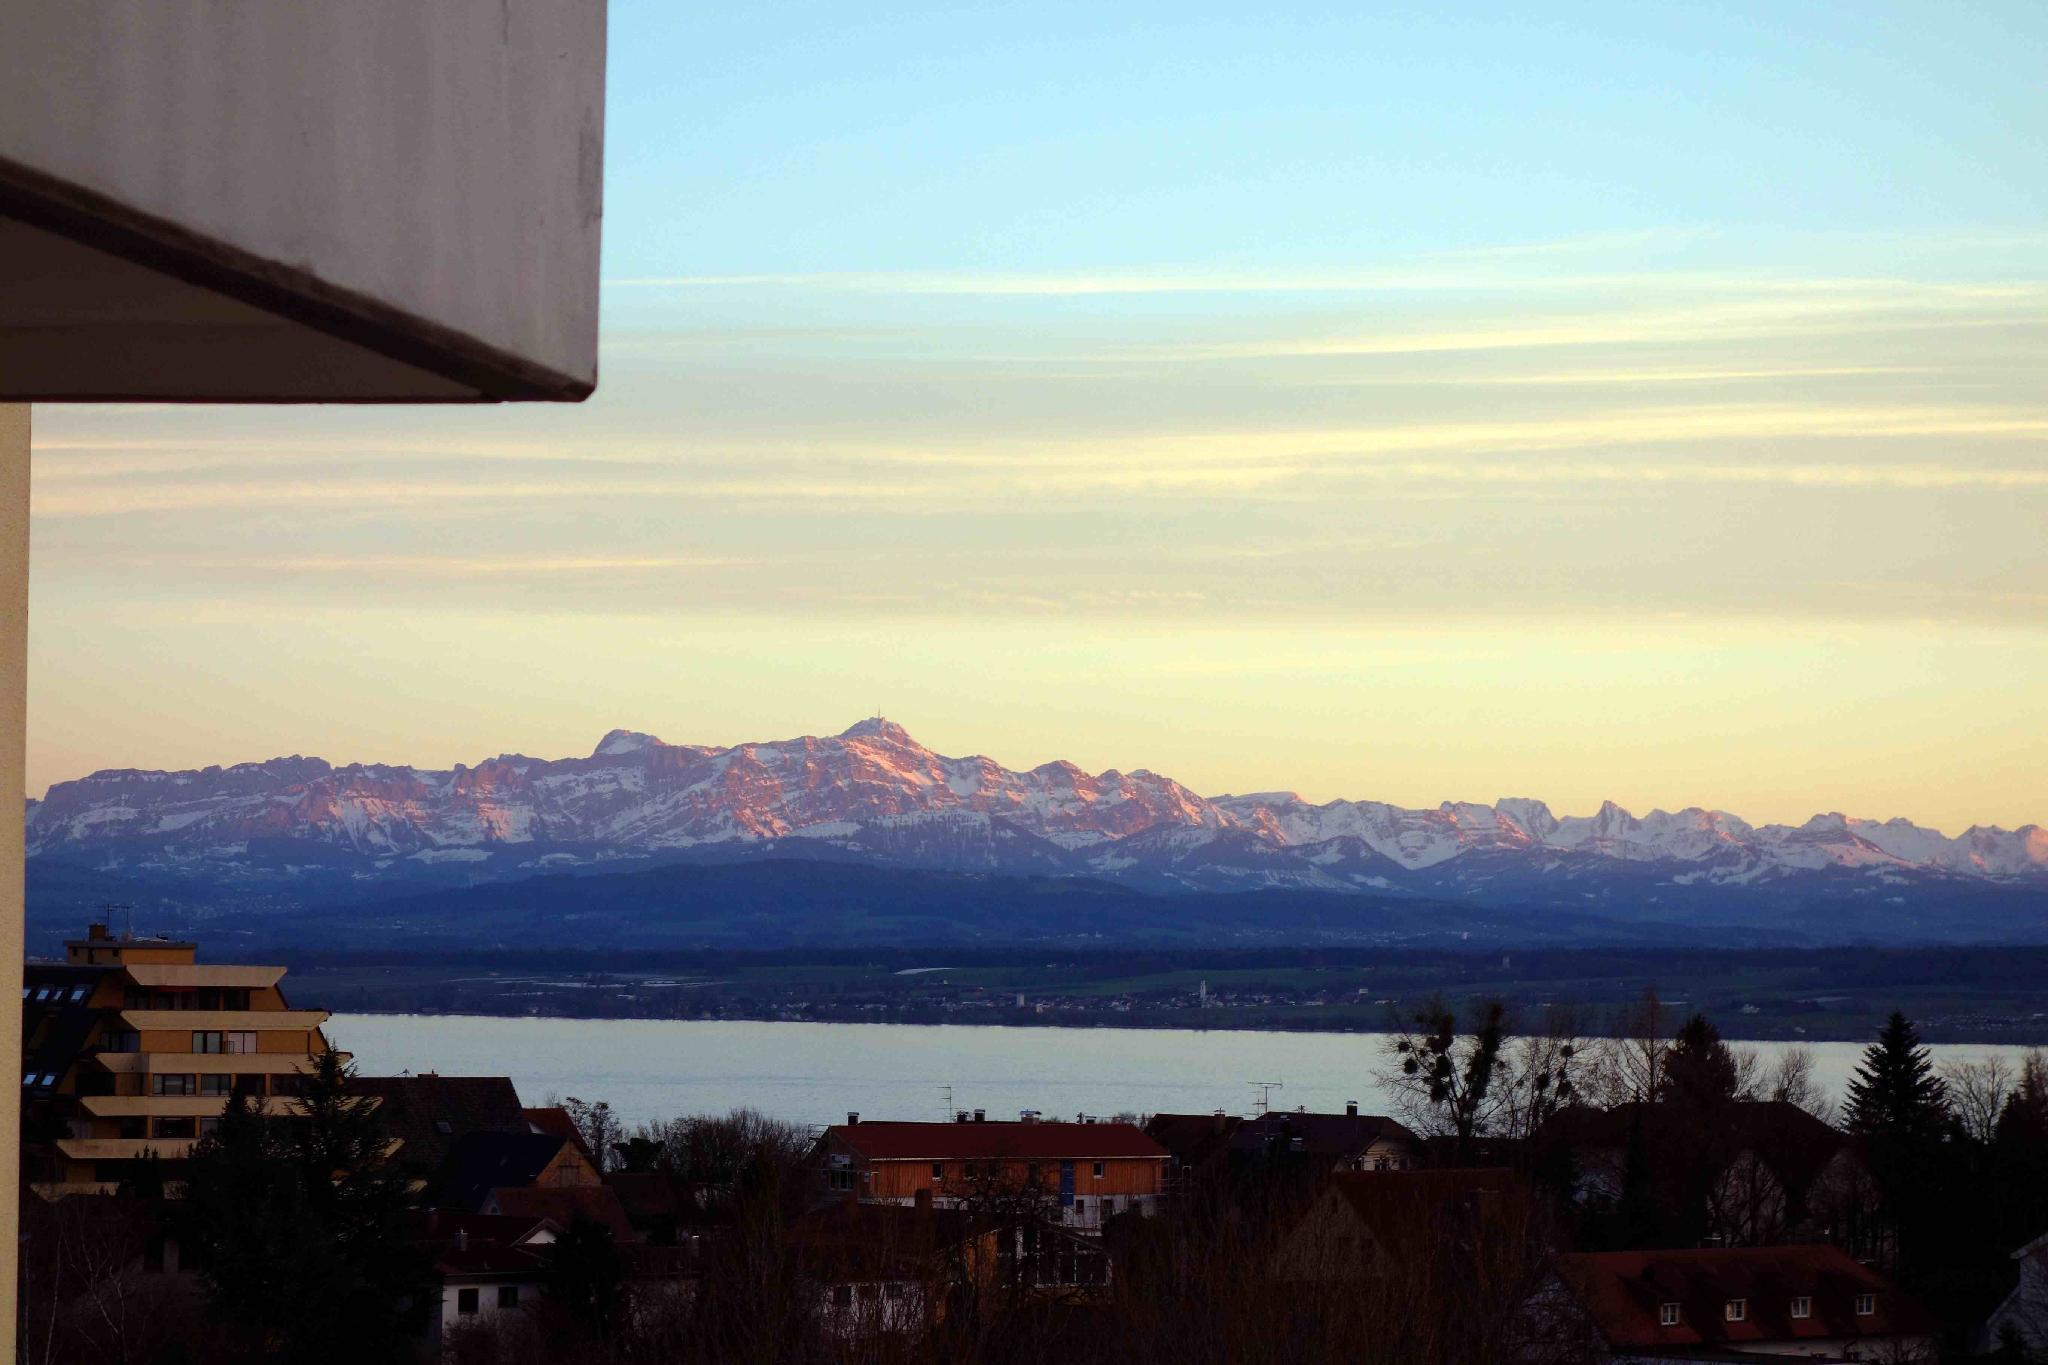 Spacious Apartment With Lake And Alpine Views